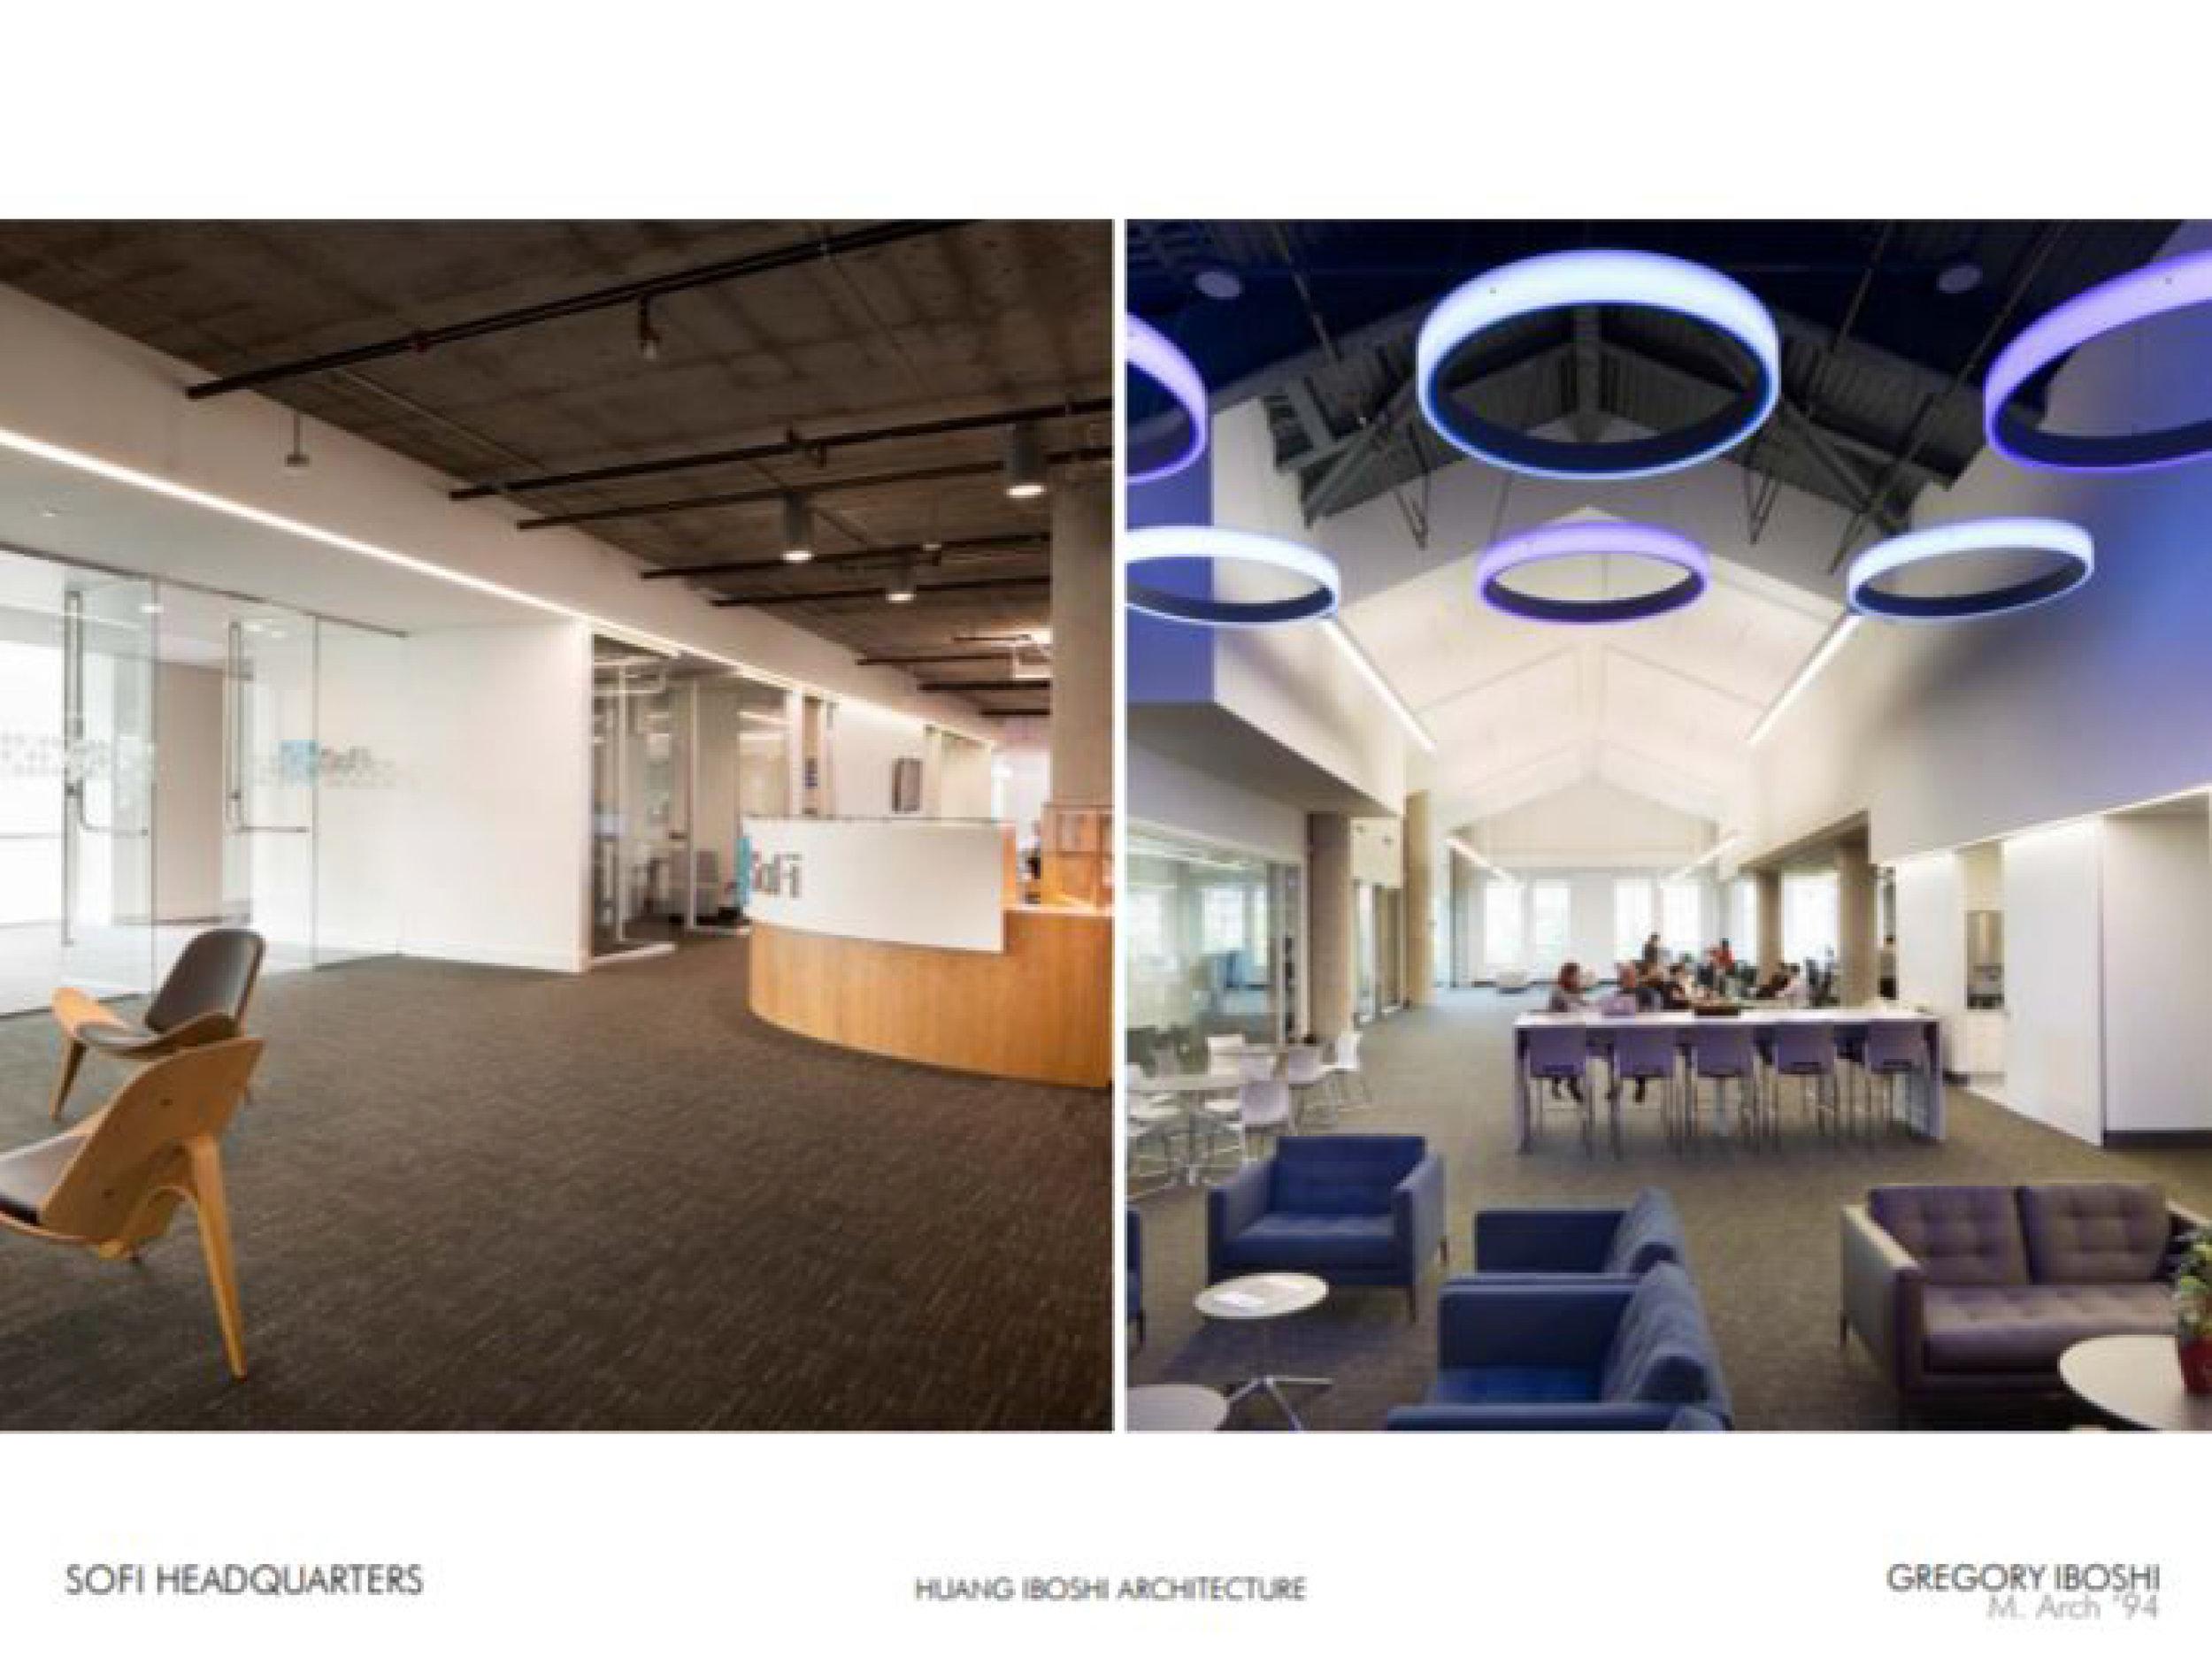 MIT ARCHITECTURE 150 SAN FRANCISCO SLIDESHOW-87 copy.jpg